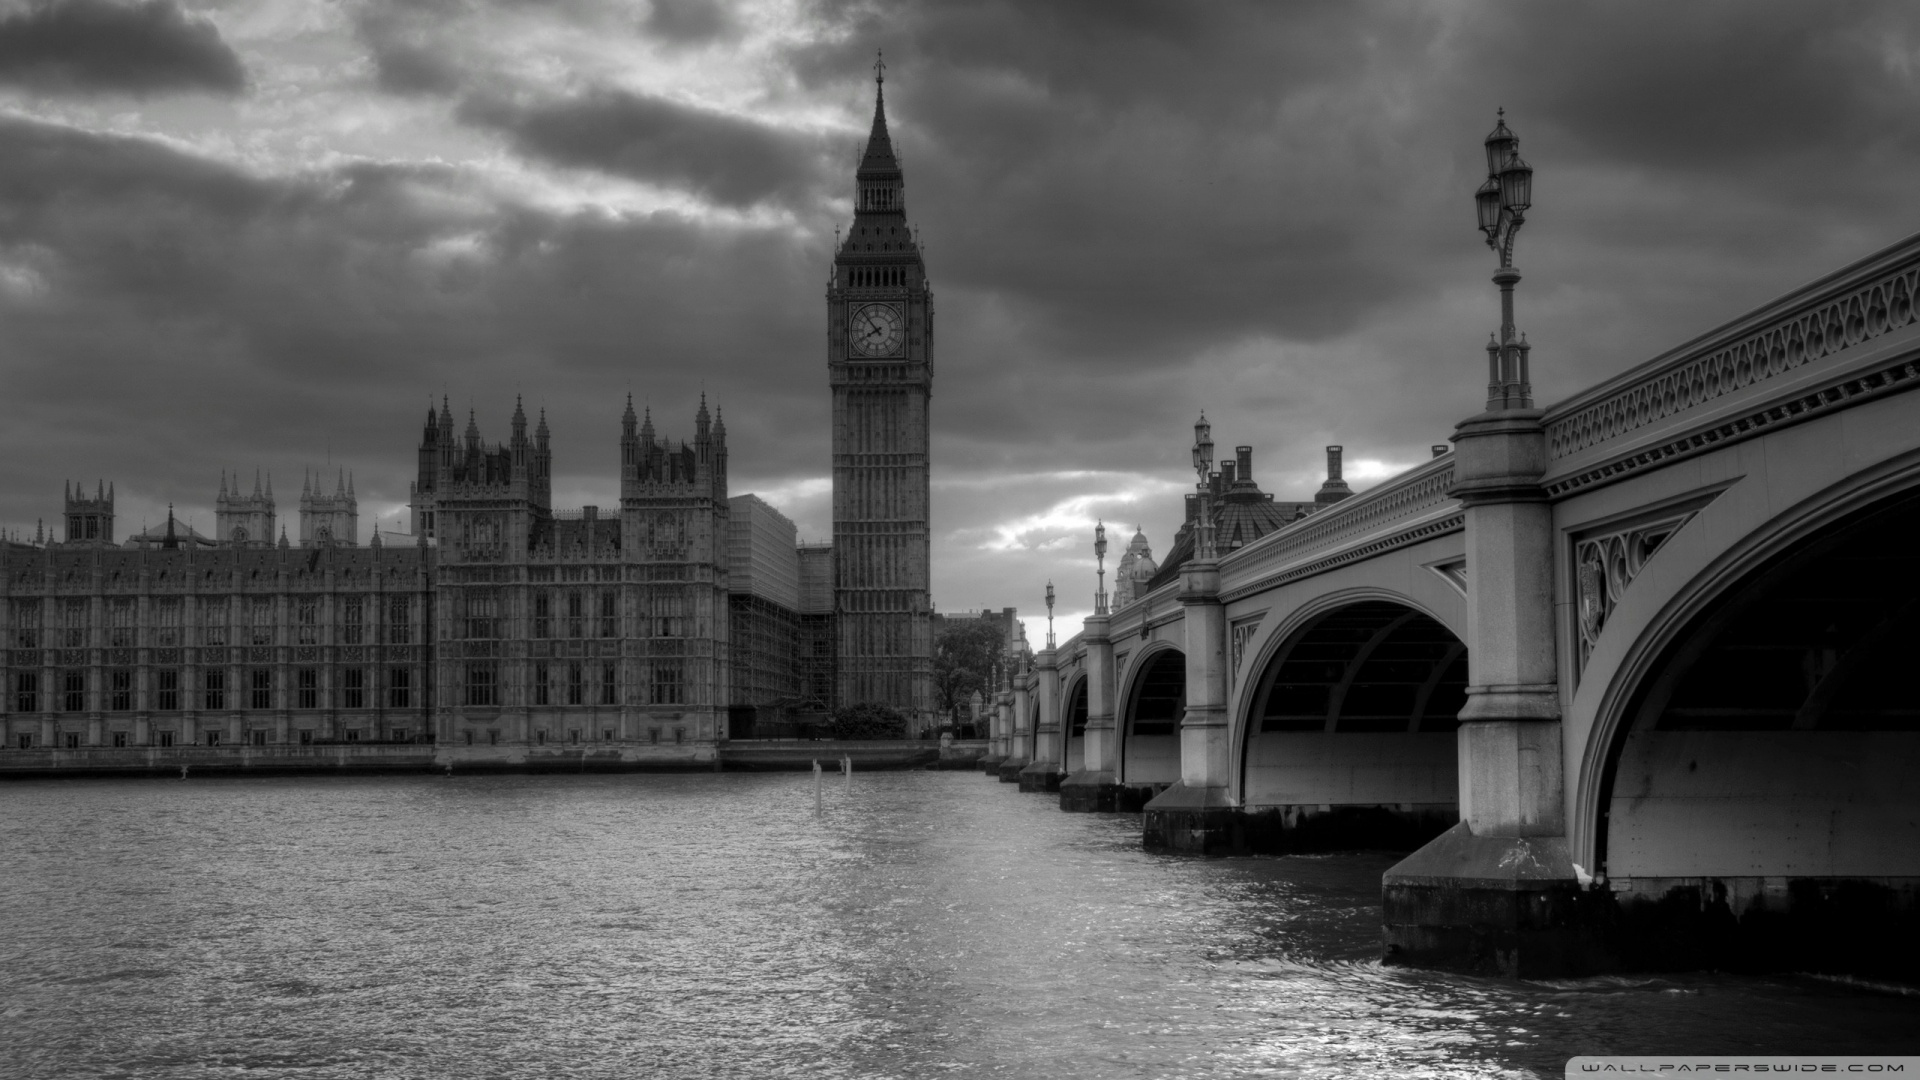 London In Black And White HD desktop wallpaper : High Definition